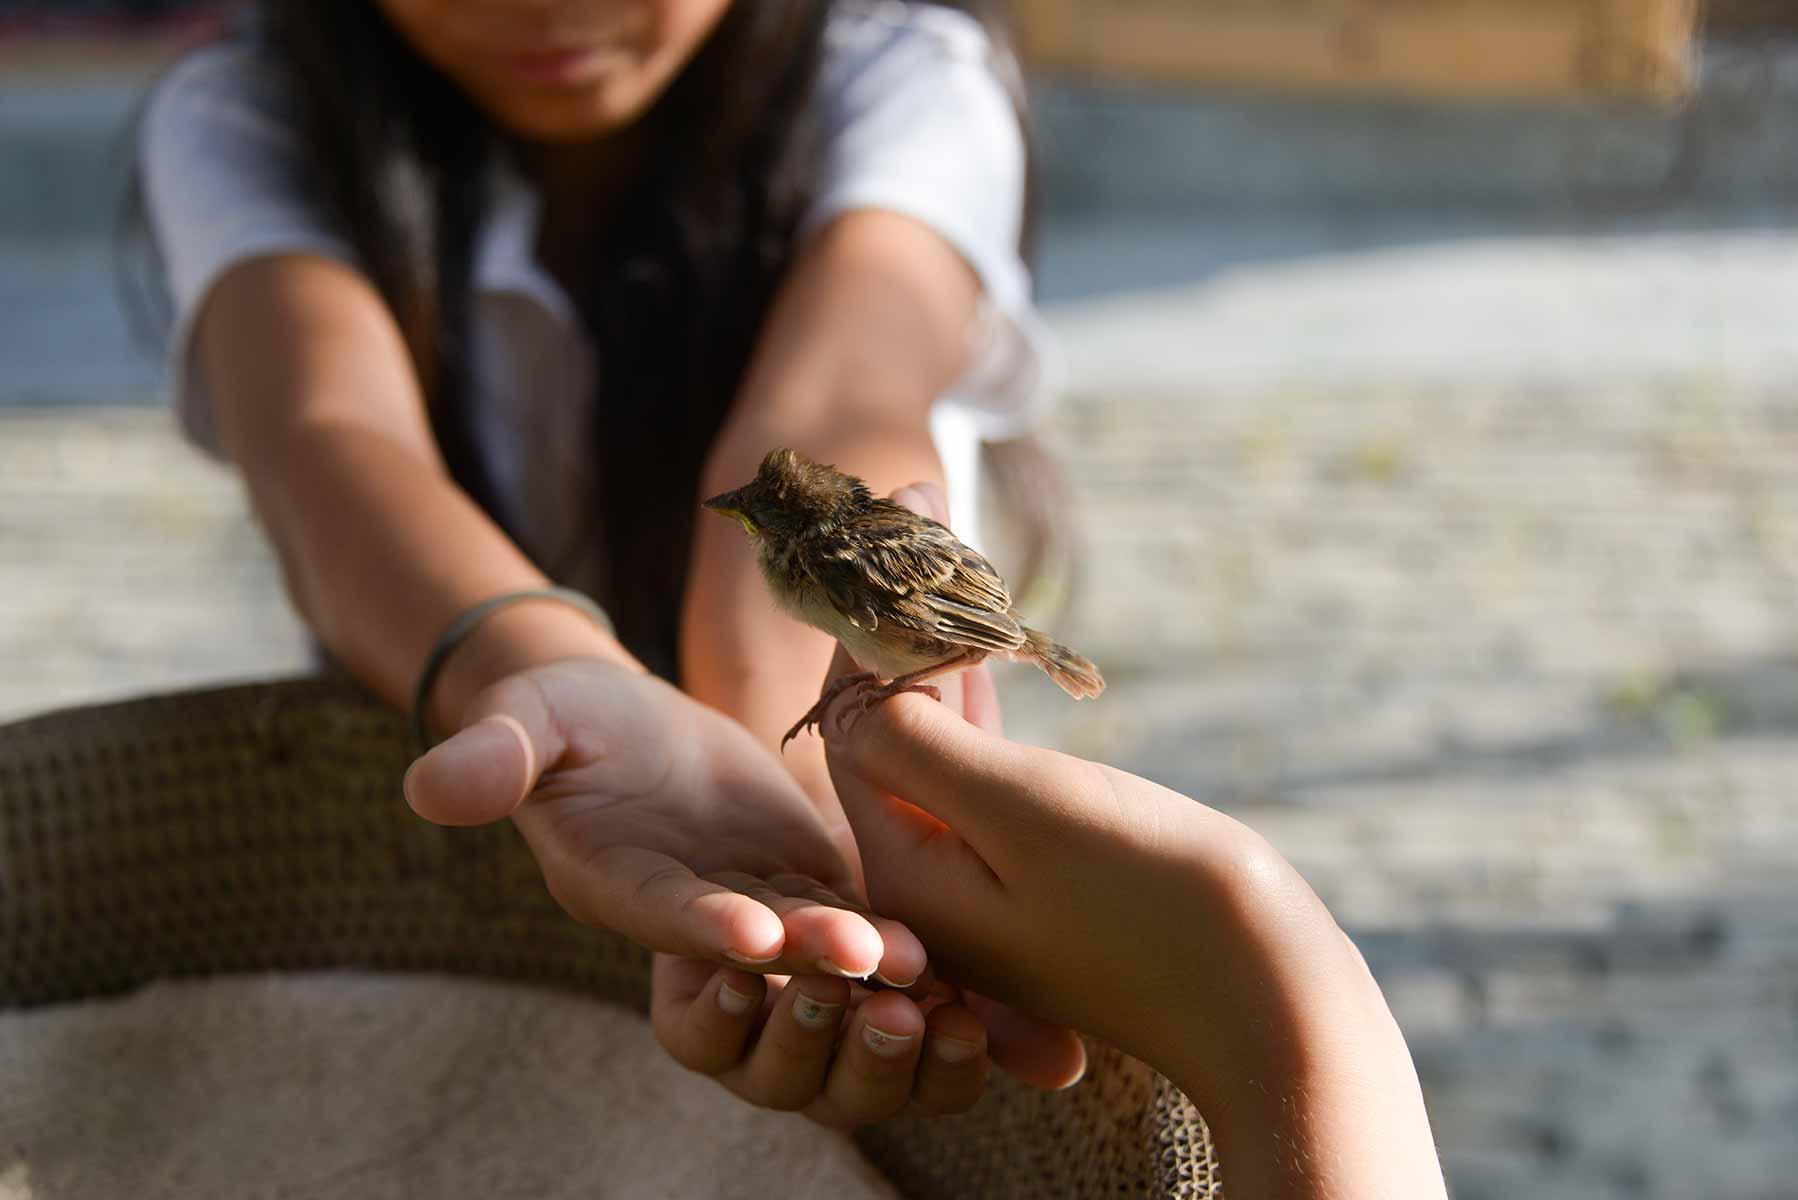 Girl with bird in her hands